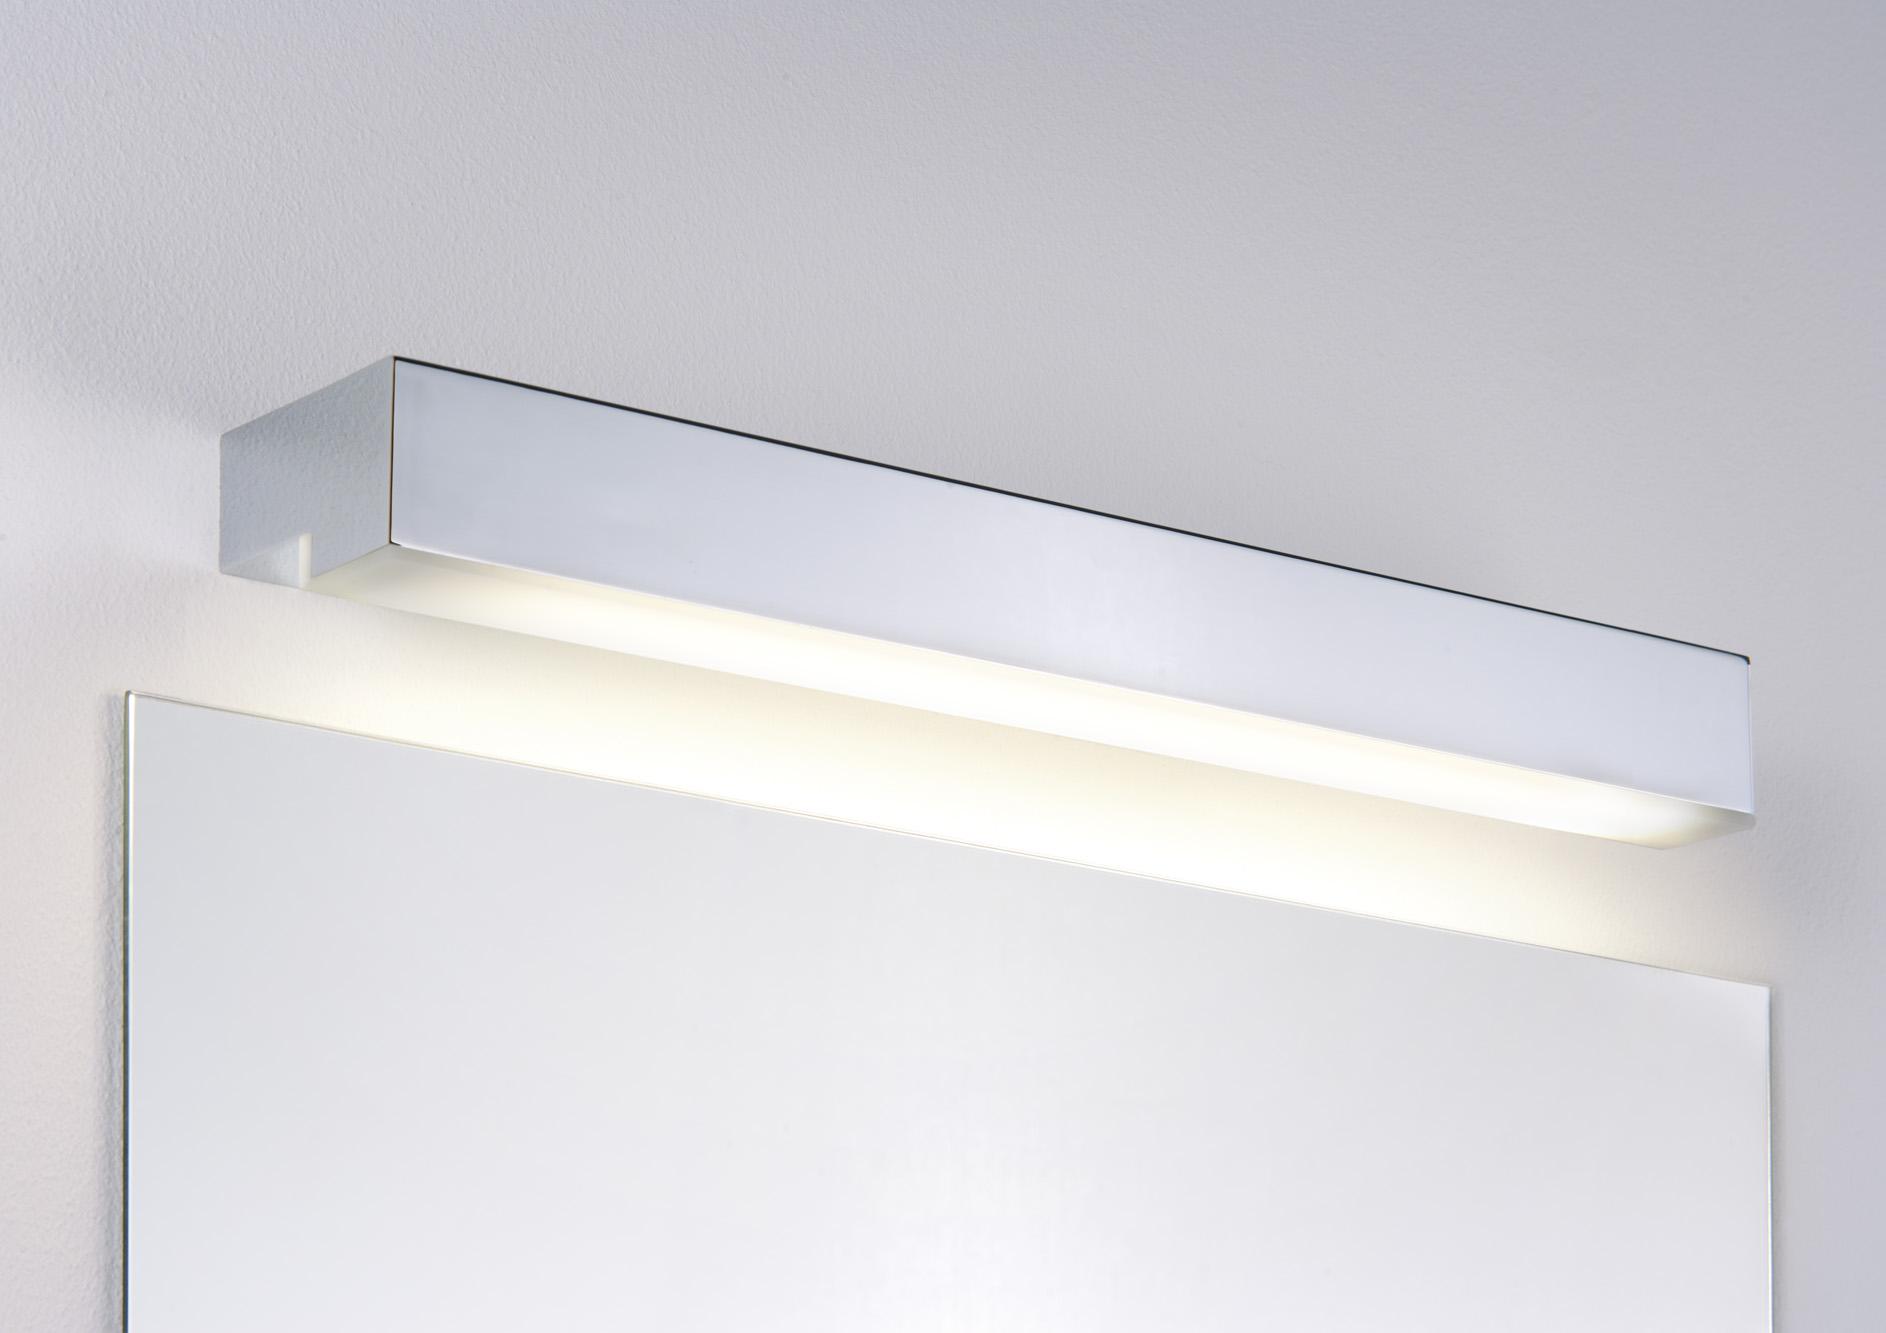 applique salle de bain paulmann taru ip44 1x14w 230v g5 t5 chrome blanc. Black Bedroom Furniture Sets. Home Design Ideas